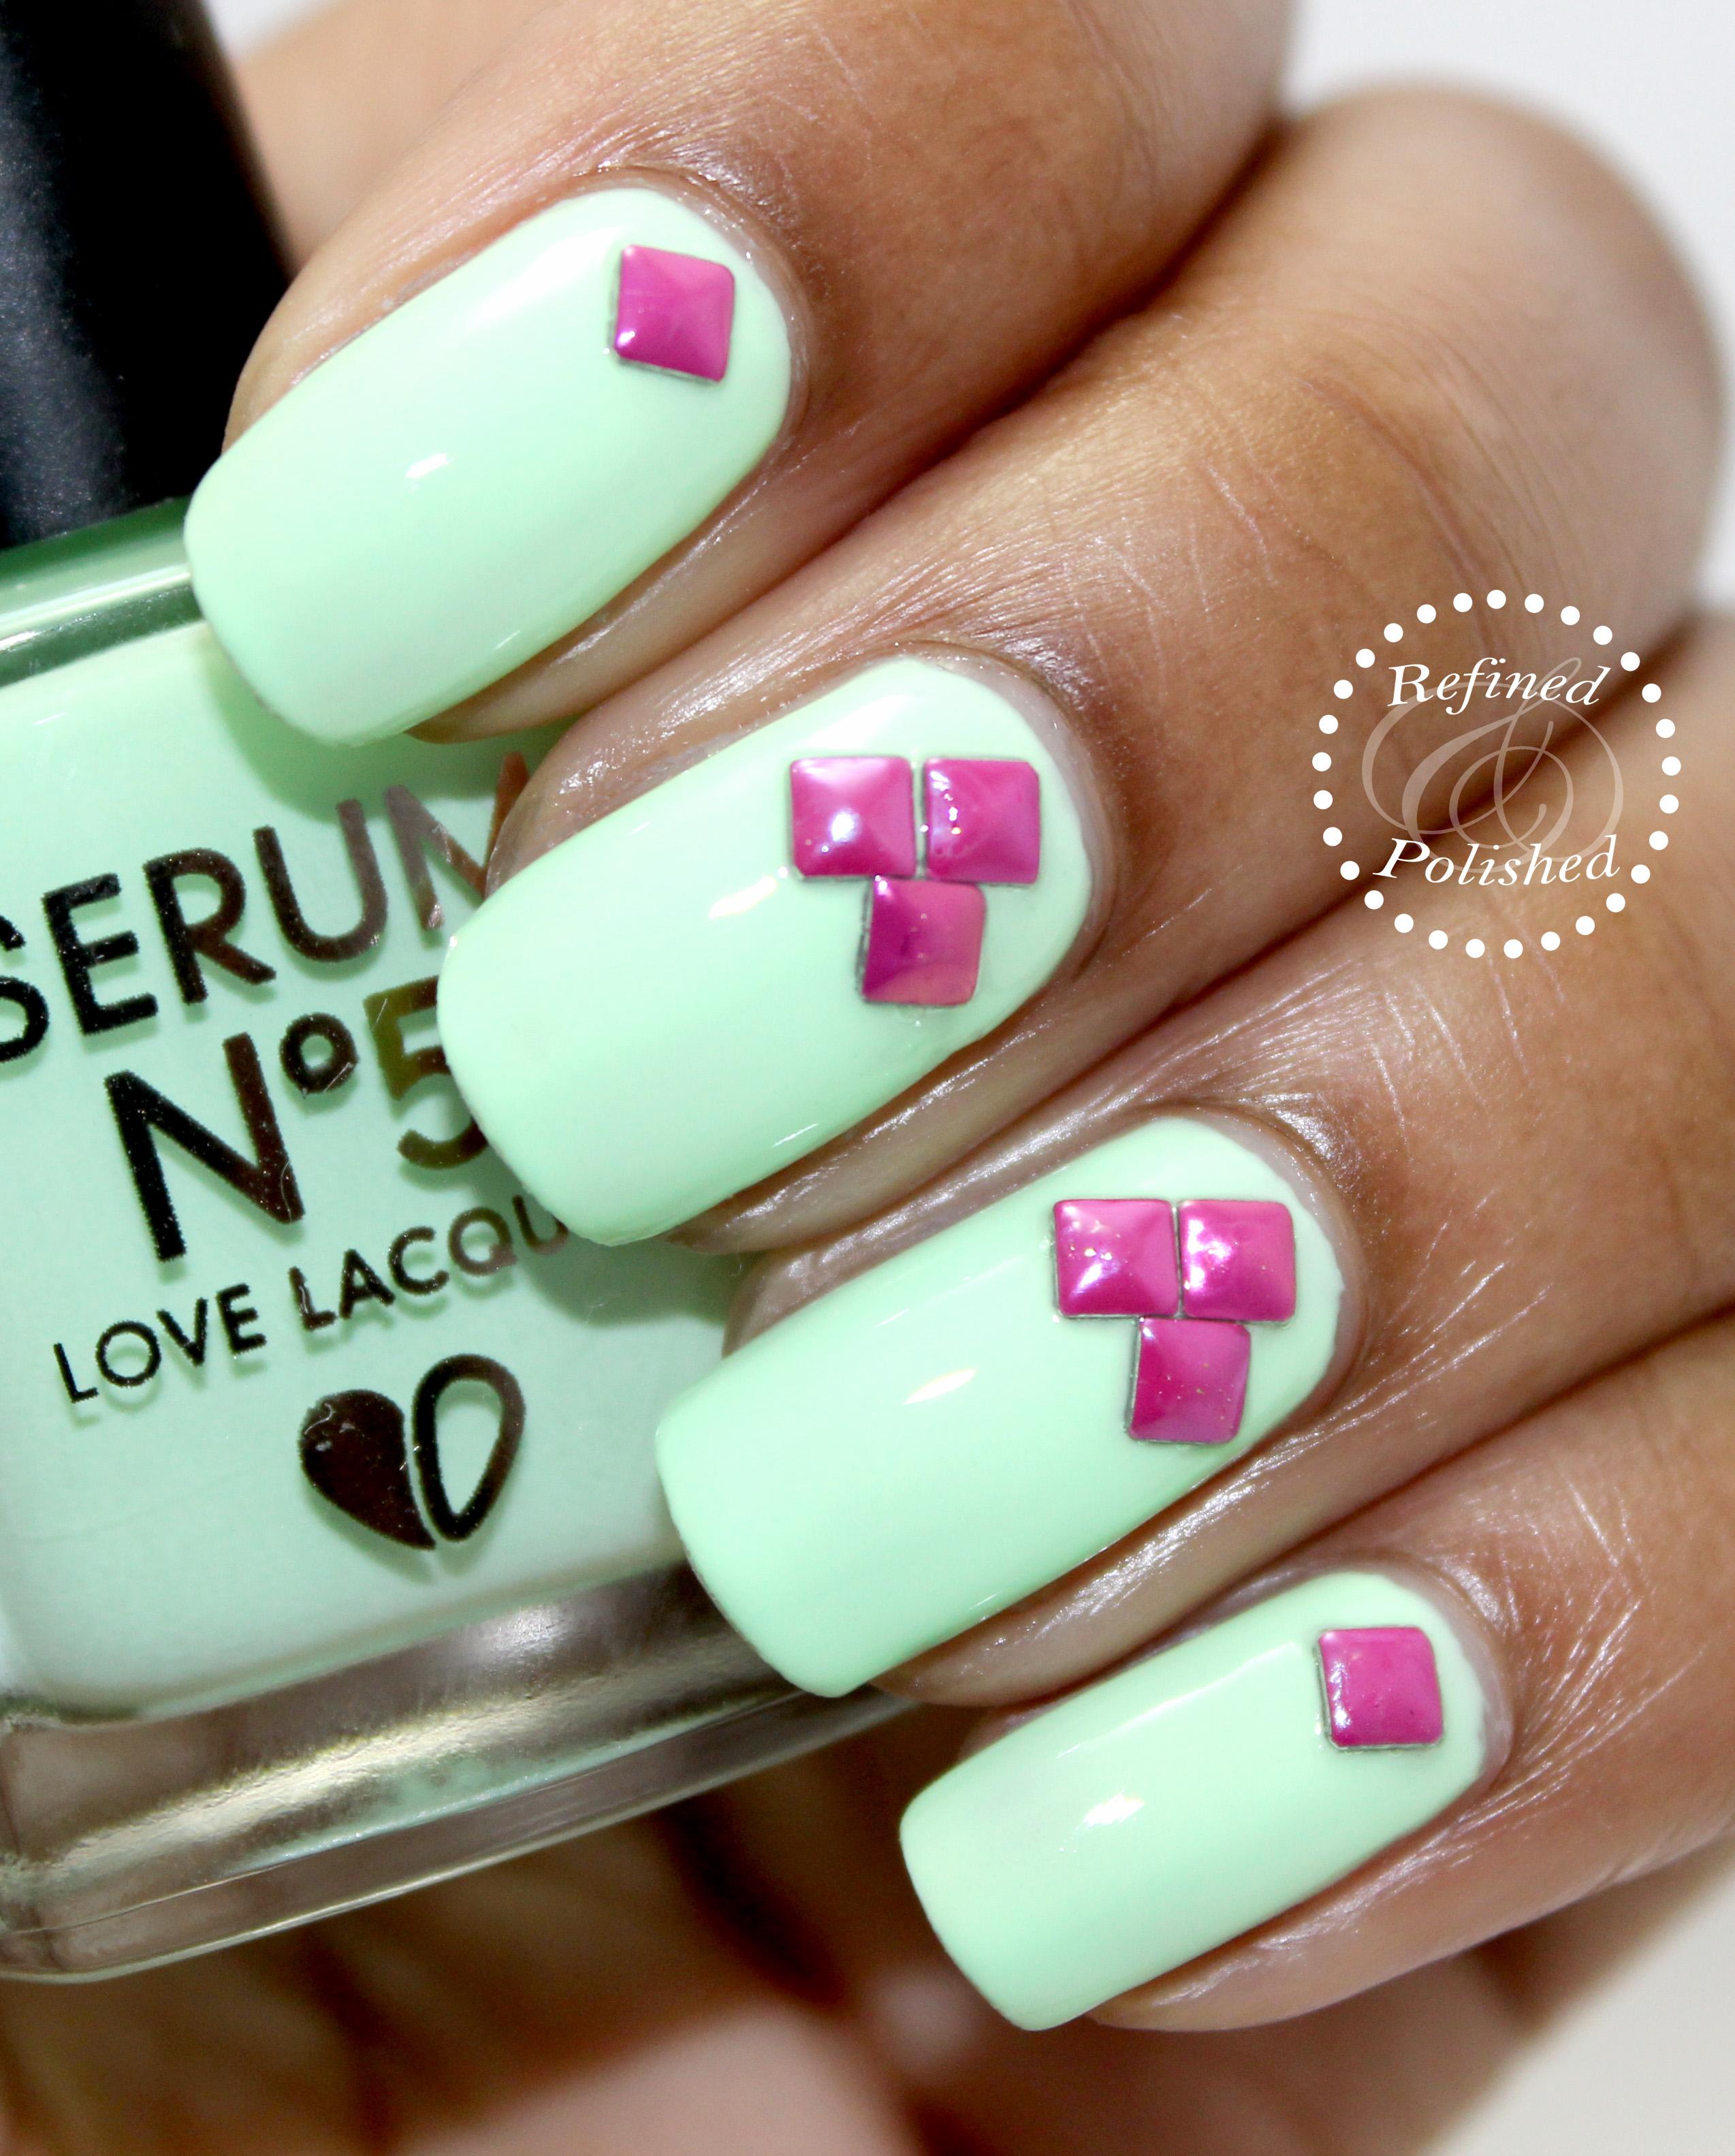 Serum No.5 Nail Art Accessories